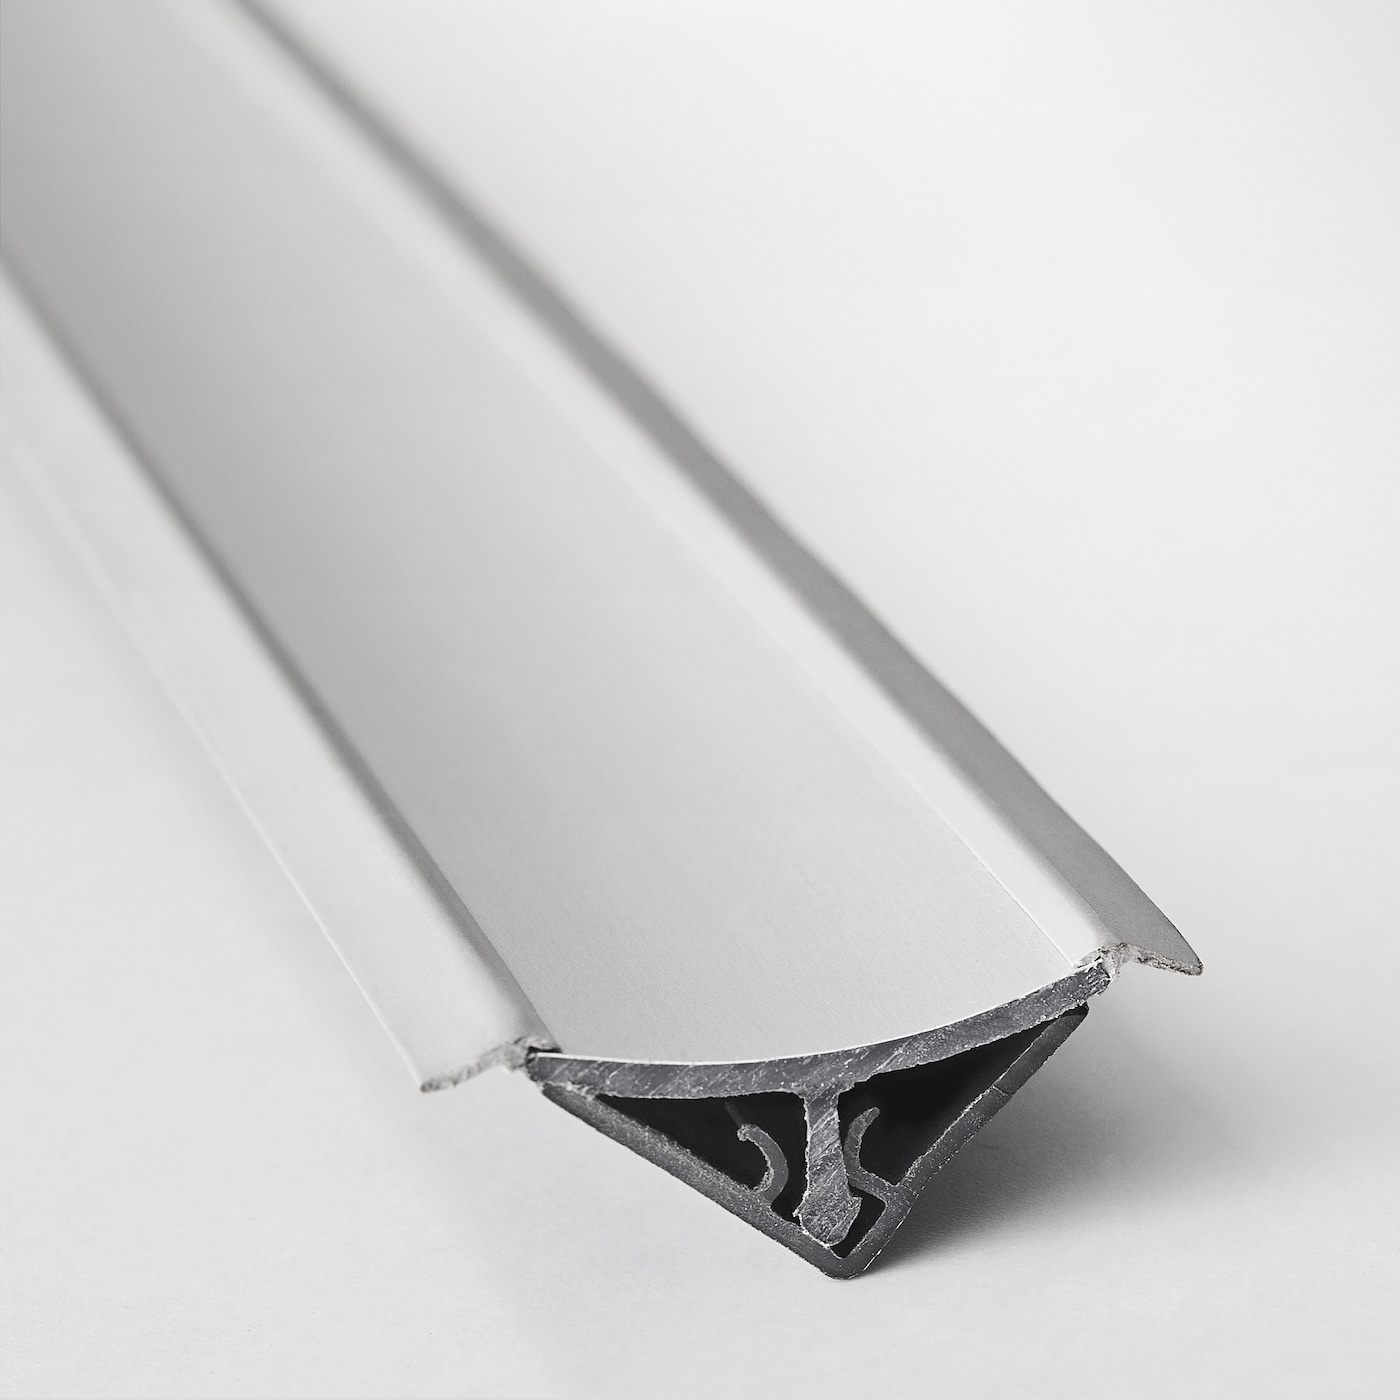 Fixa Wandabschlussleiste Grau Ikea Deutschland